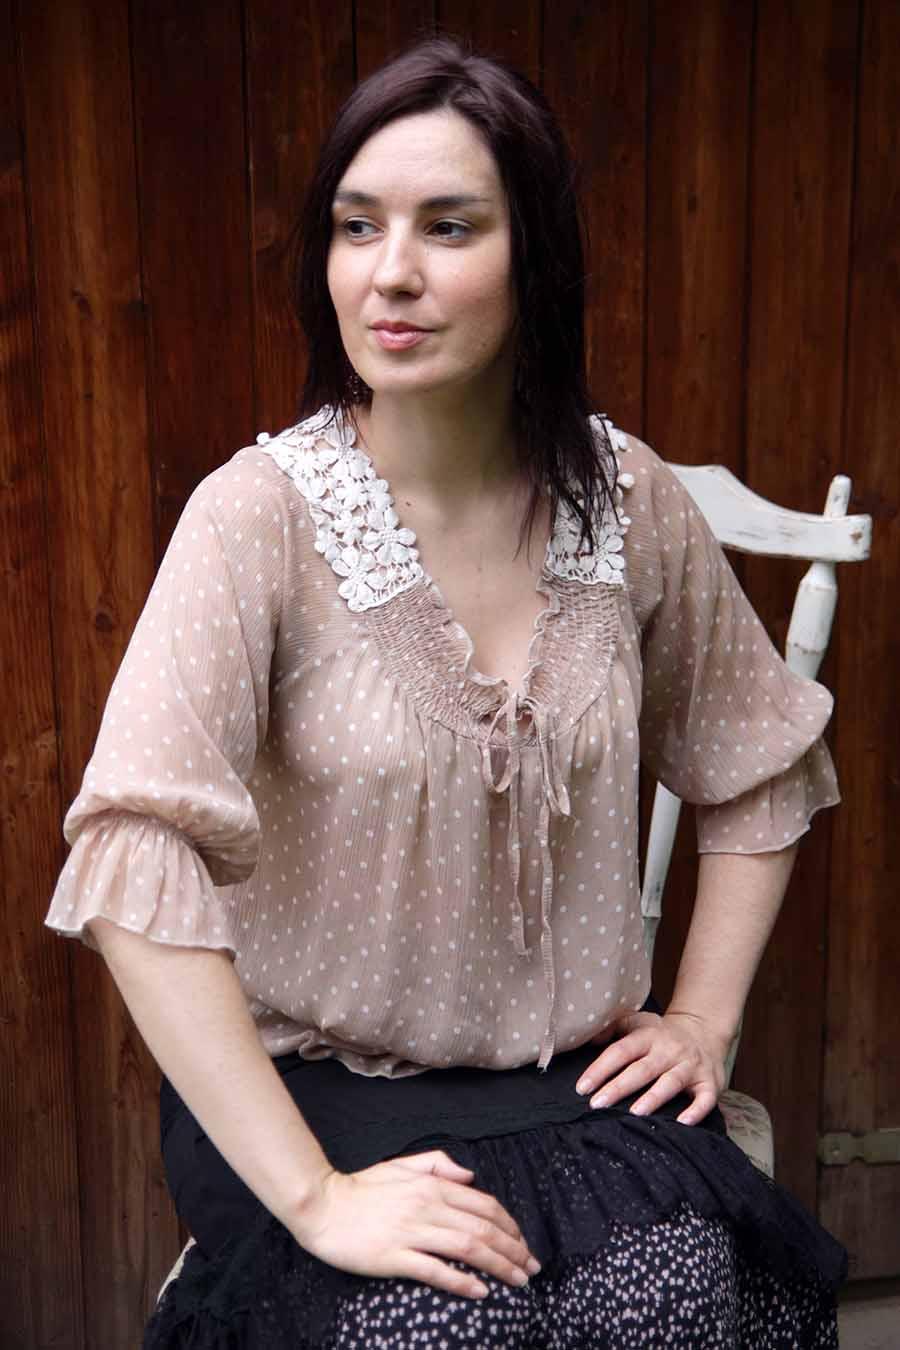 Light viscose blouse - La Gitanilla Flamenca_flamenco fashion_Juana_Blouse